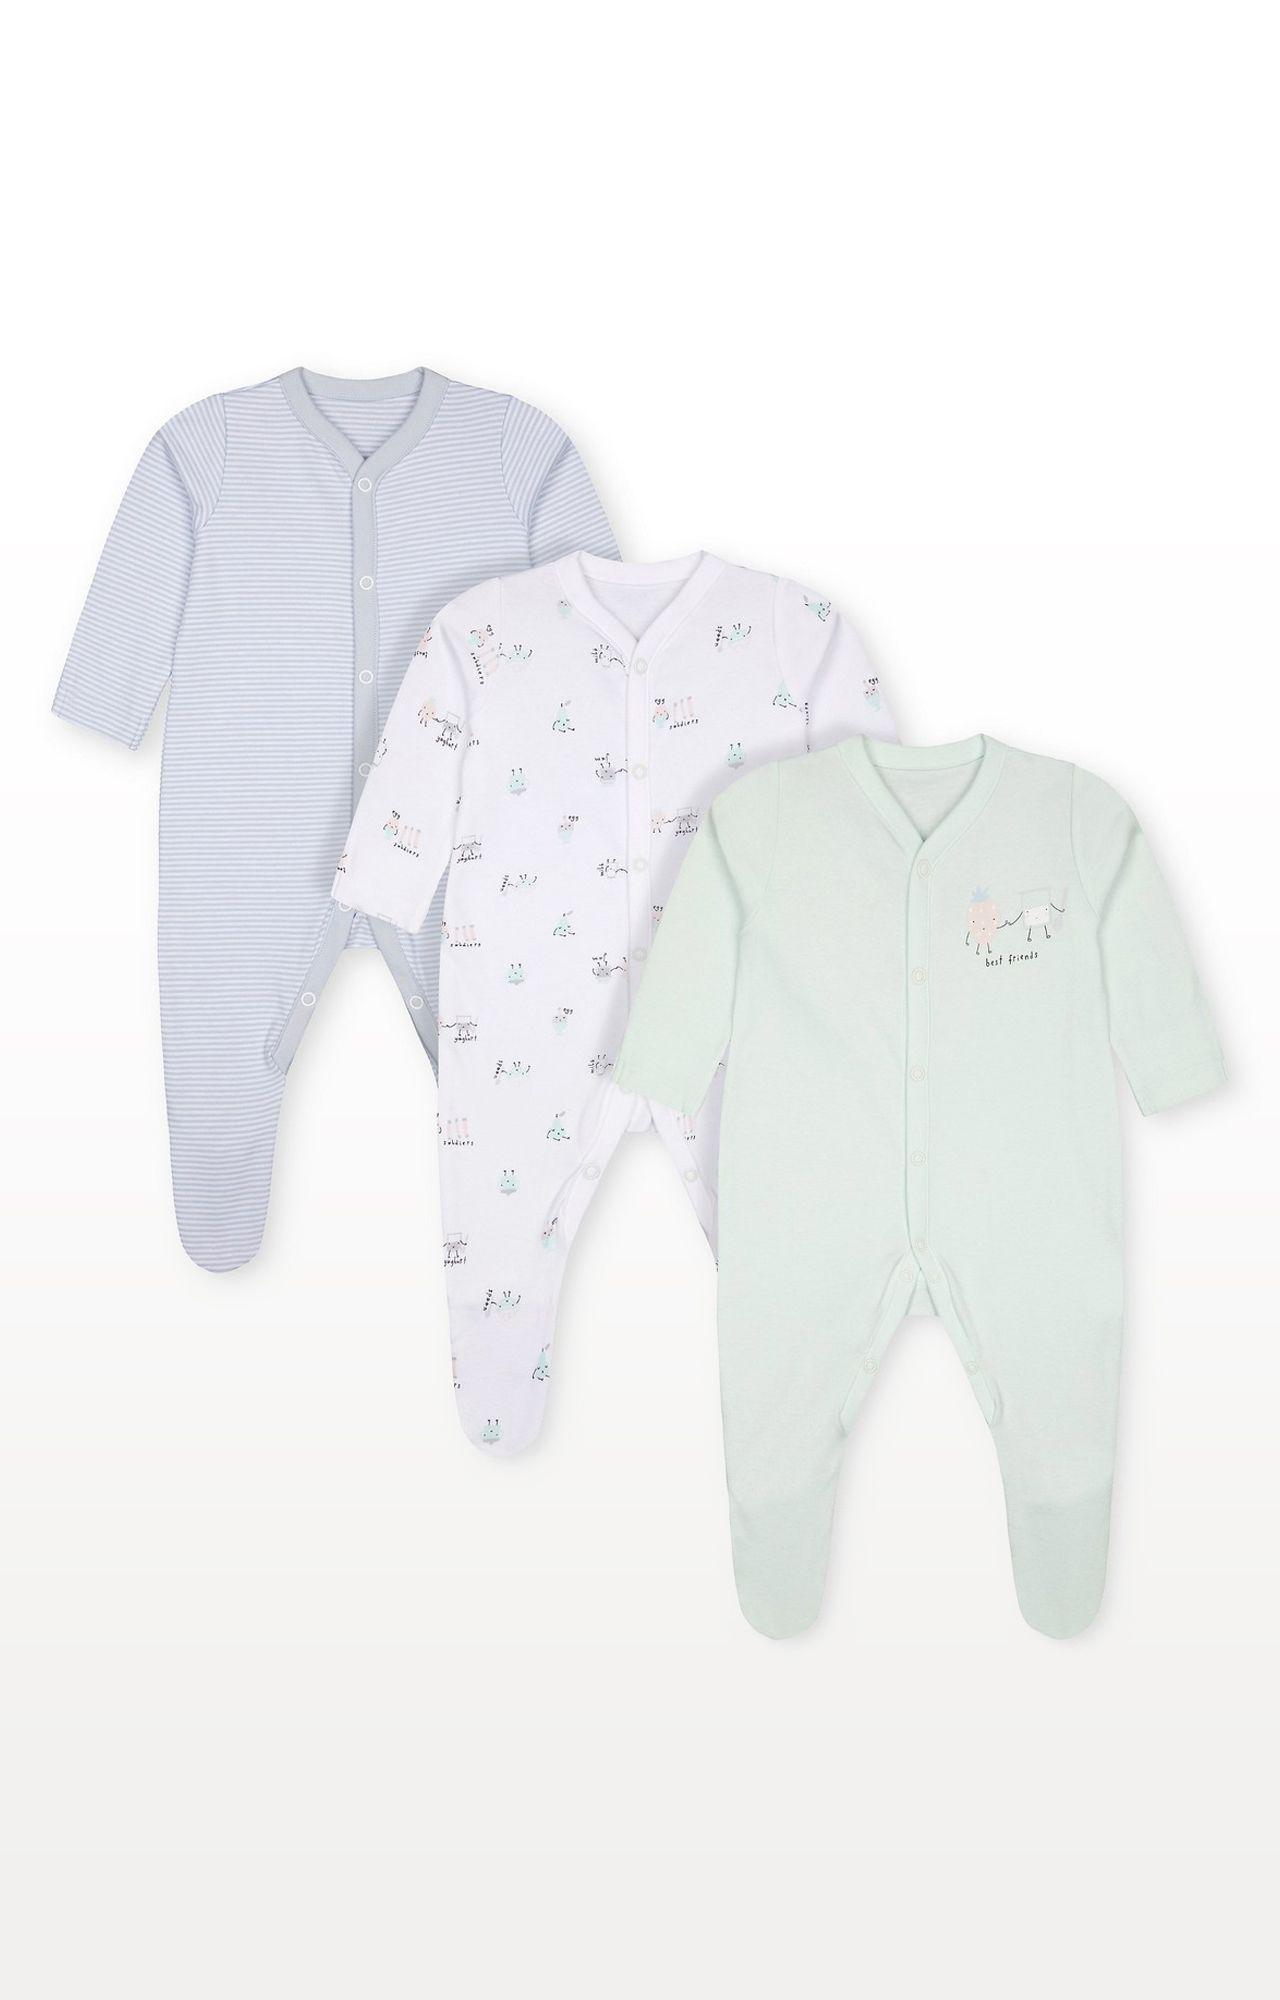 Mothercare   Breakfast Buddies Sleepsuits - Pack of 3